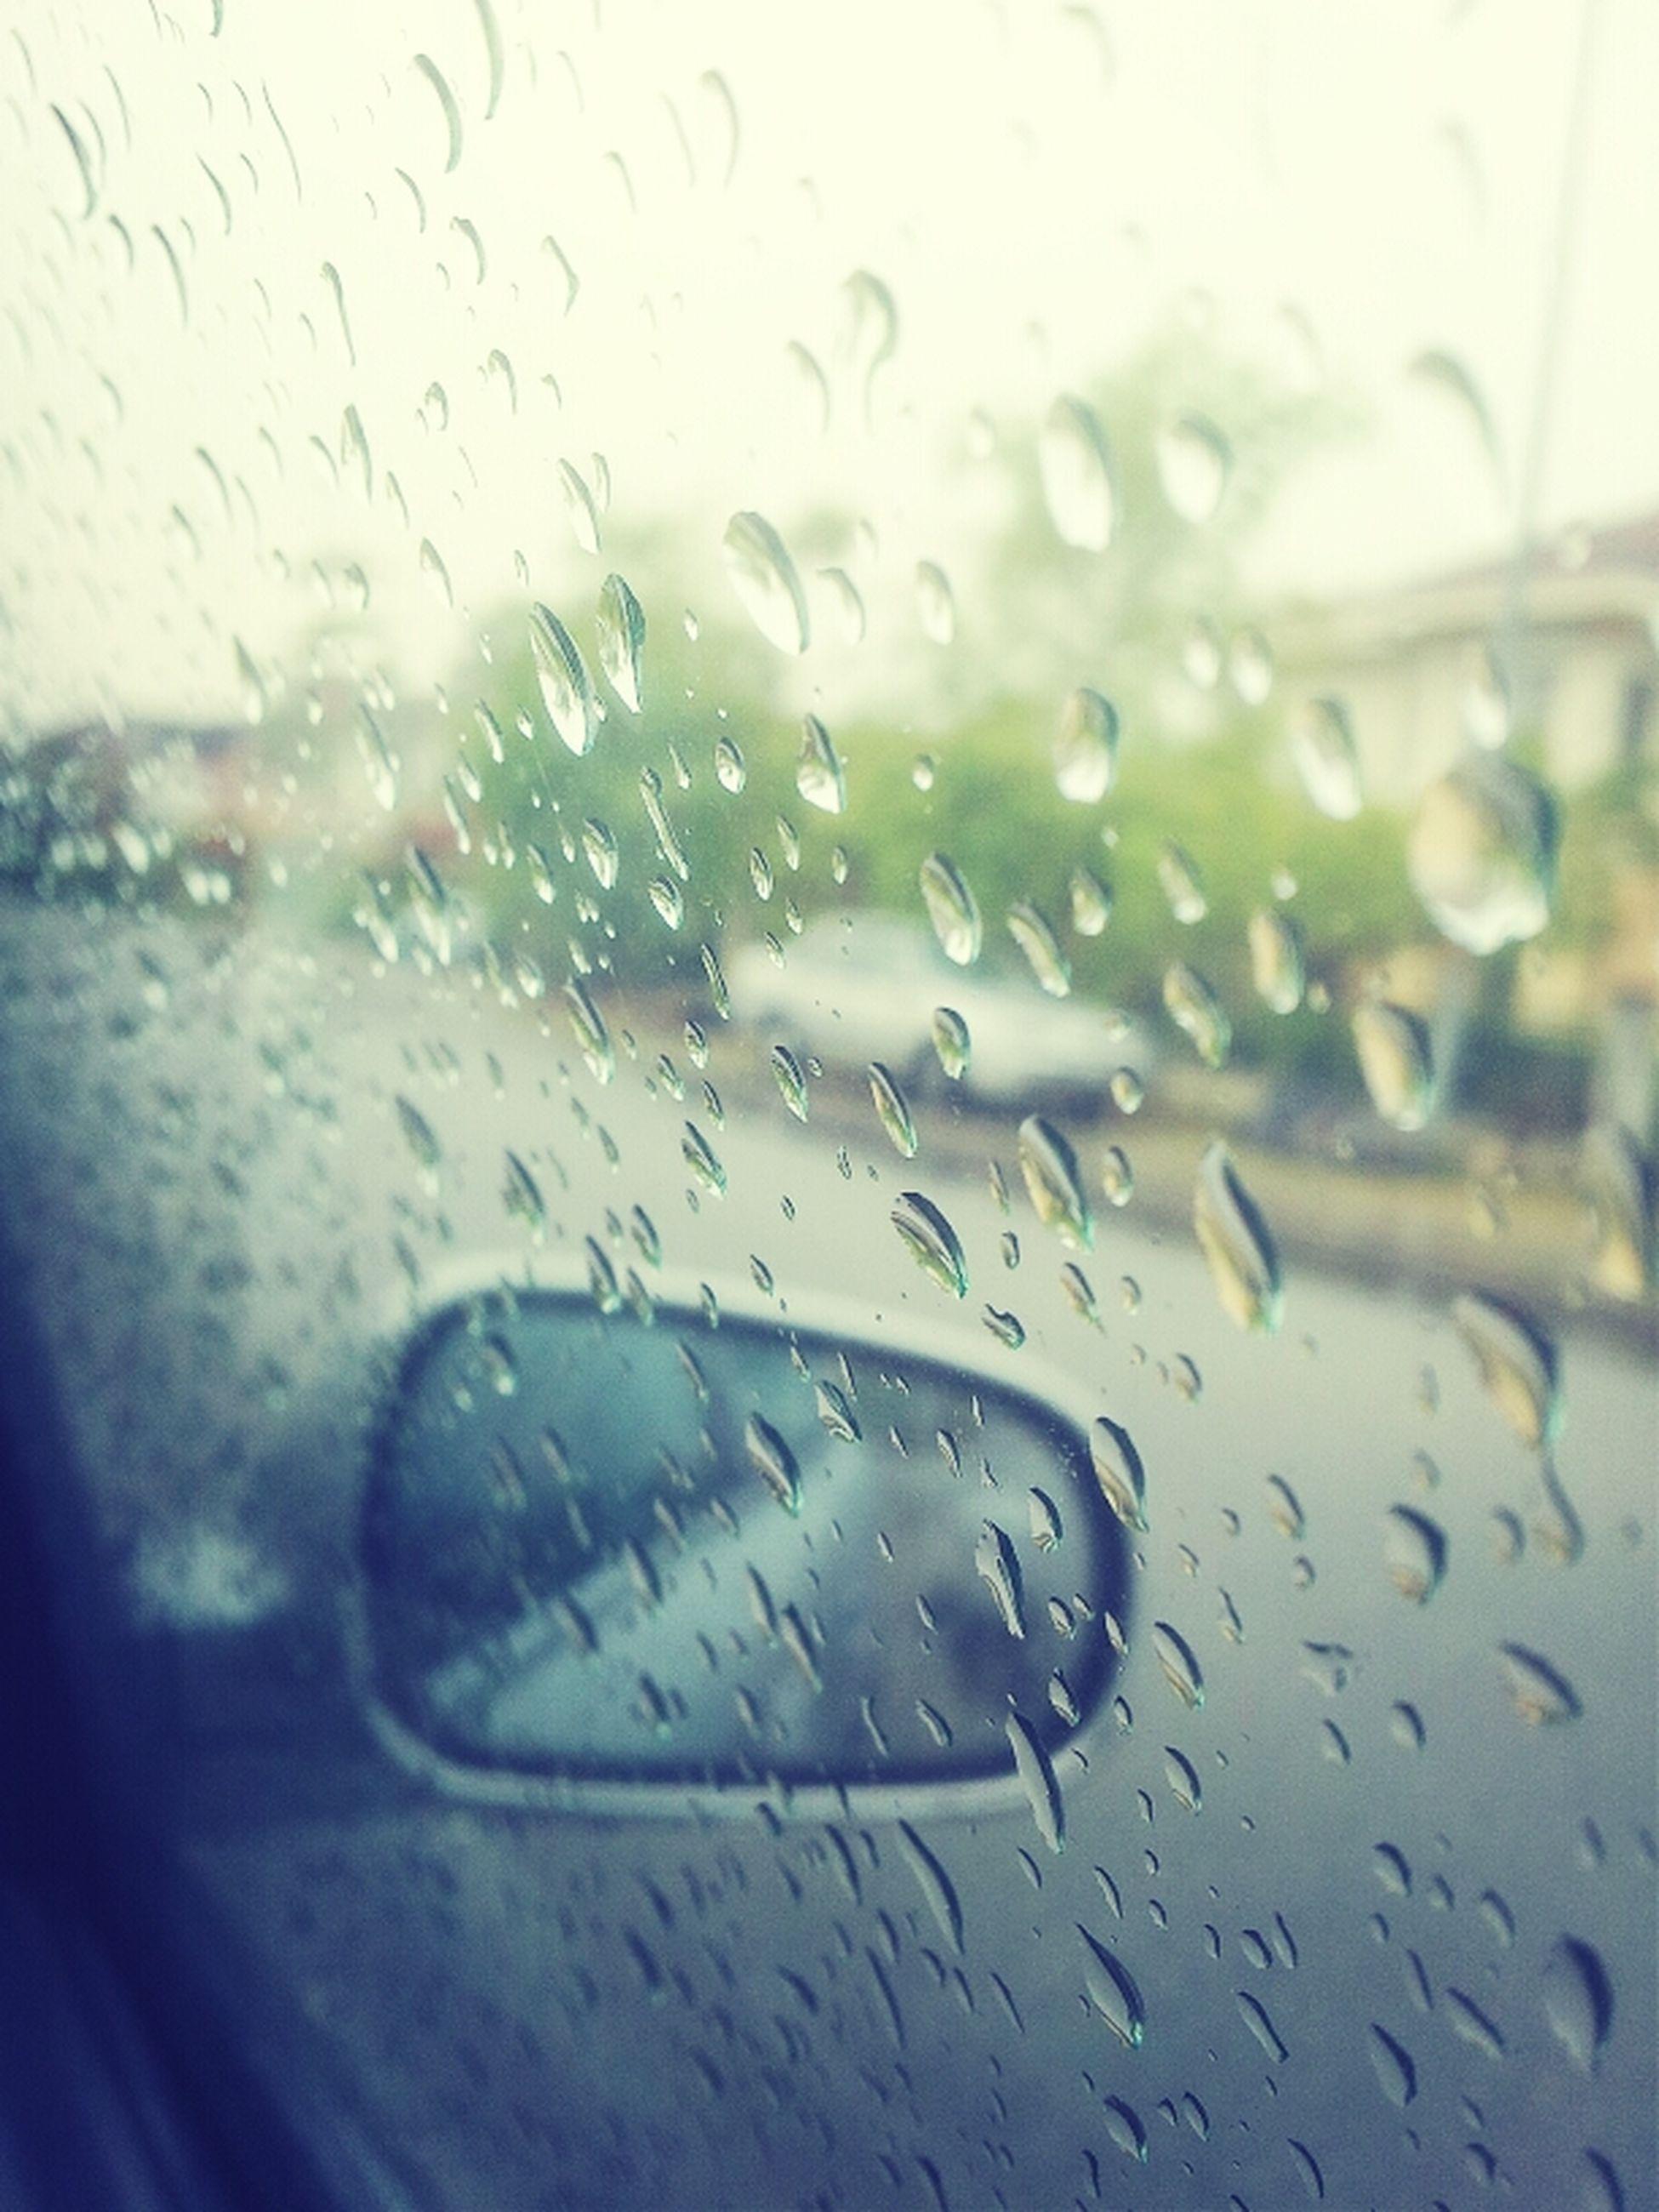 drop, window, transportation, transparent, glass - material, wet, rain, mode of transport, water, car, vehicle interior, land vehicle, raindrop, weather, indoors, car interior, season, windshield, close-up, glass